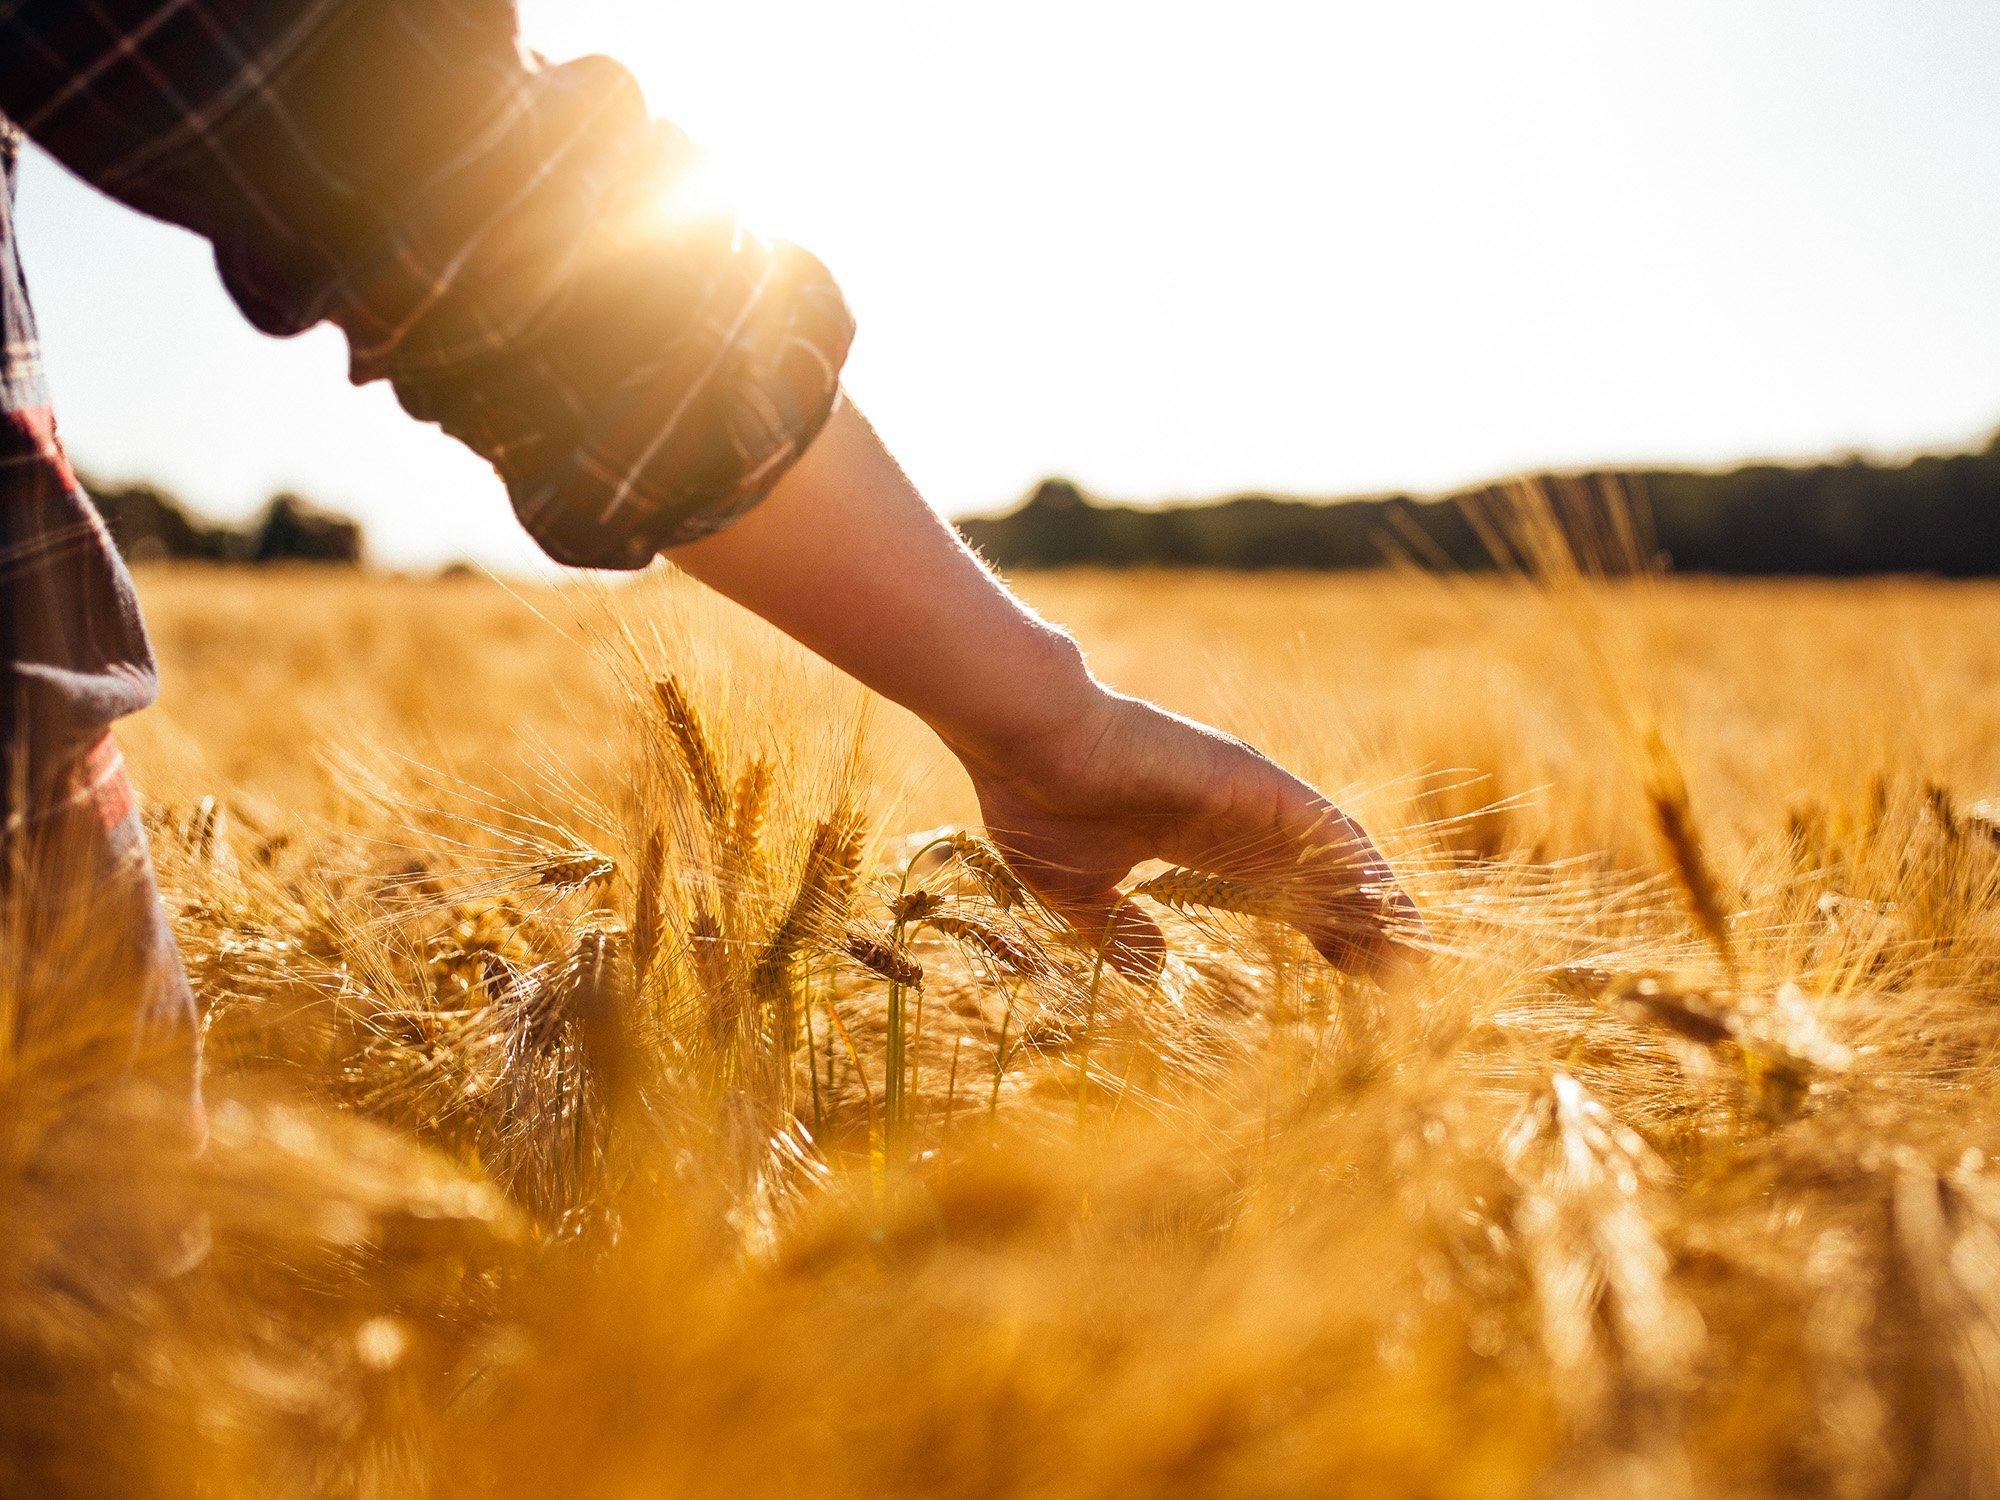 Man touching golden heads of wheat while walking through field